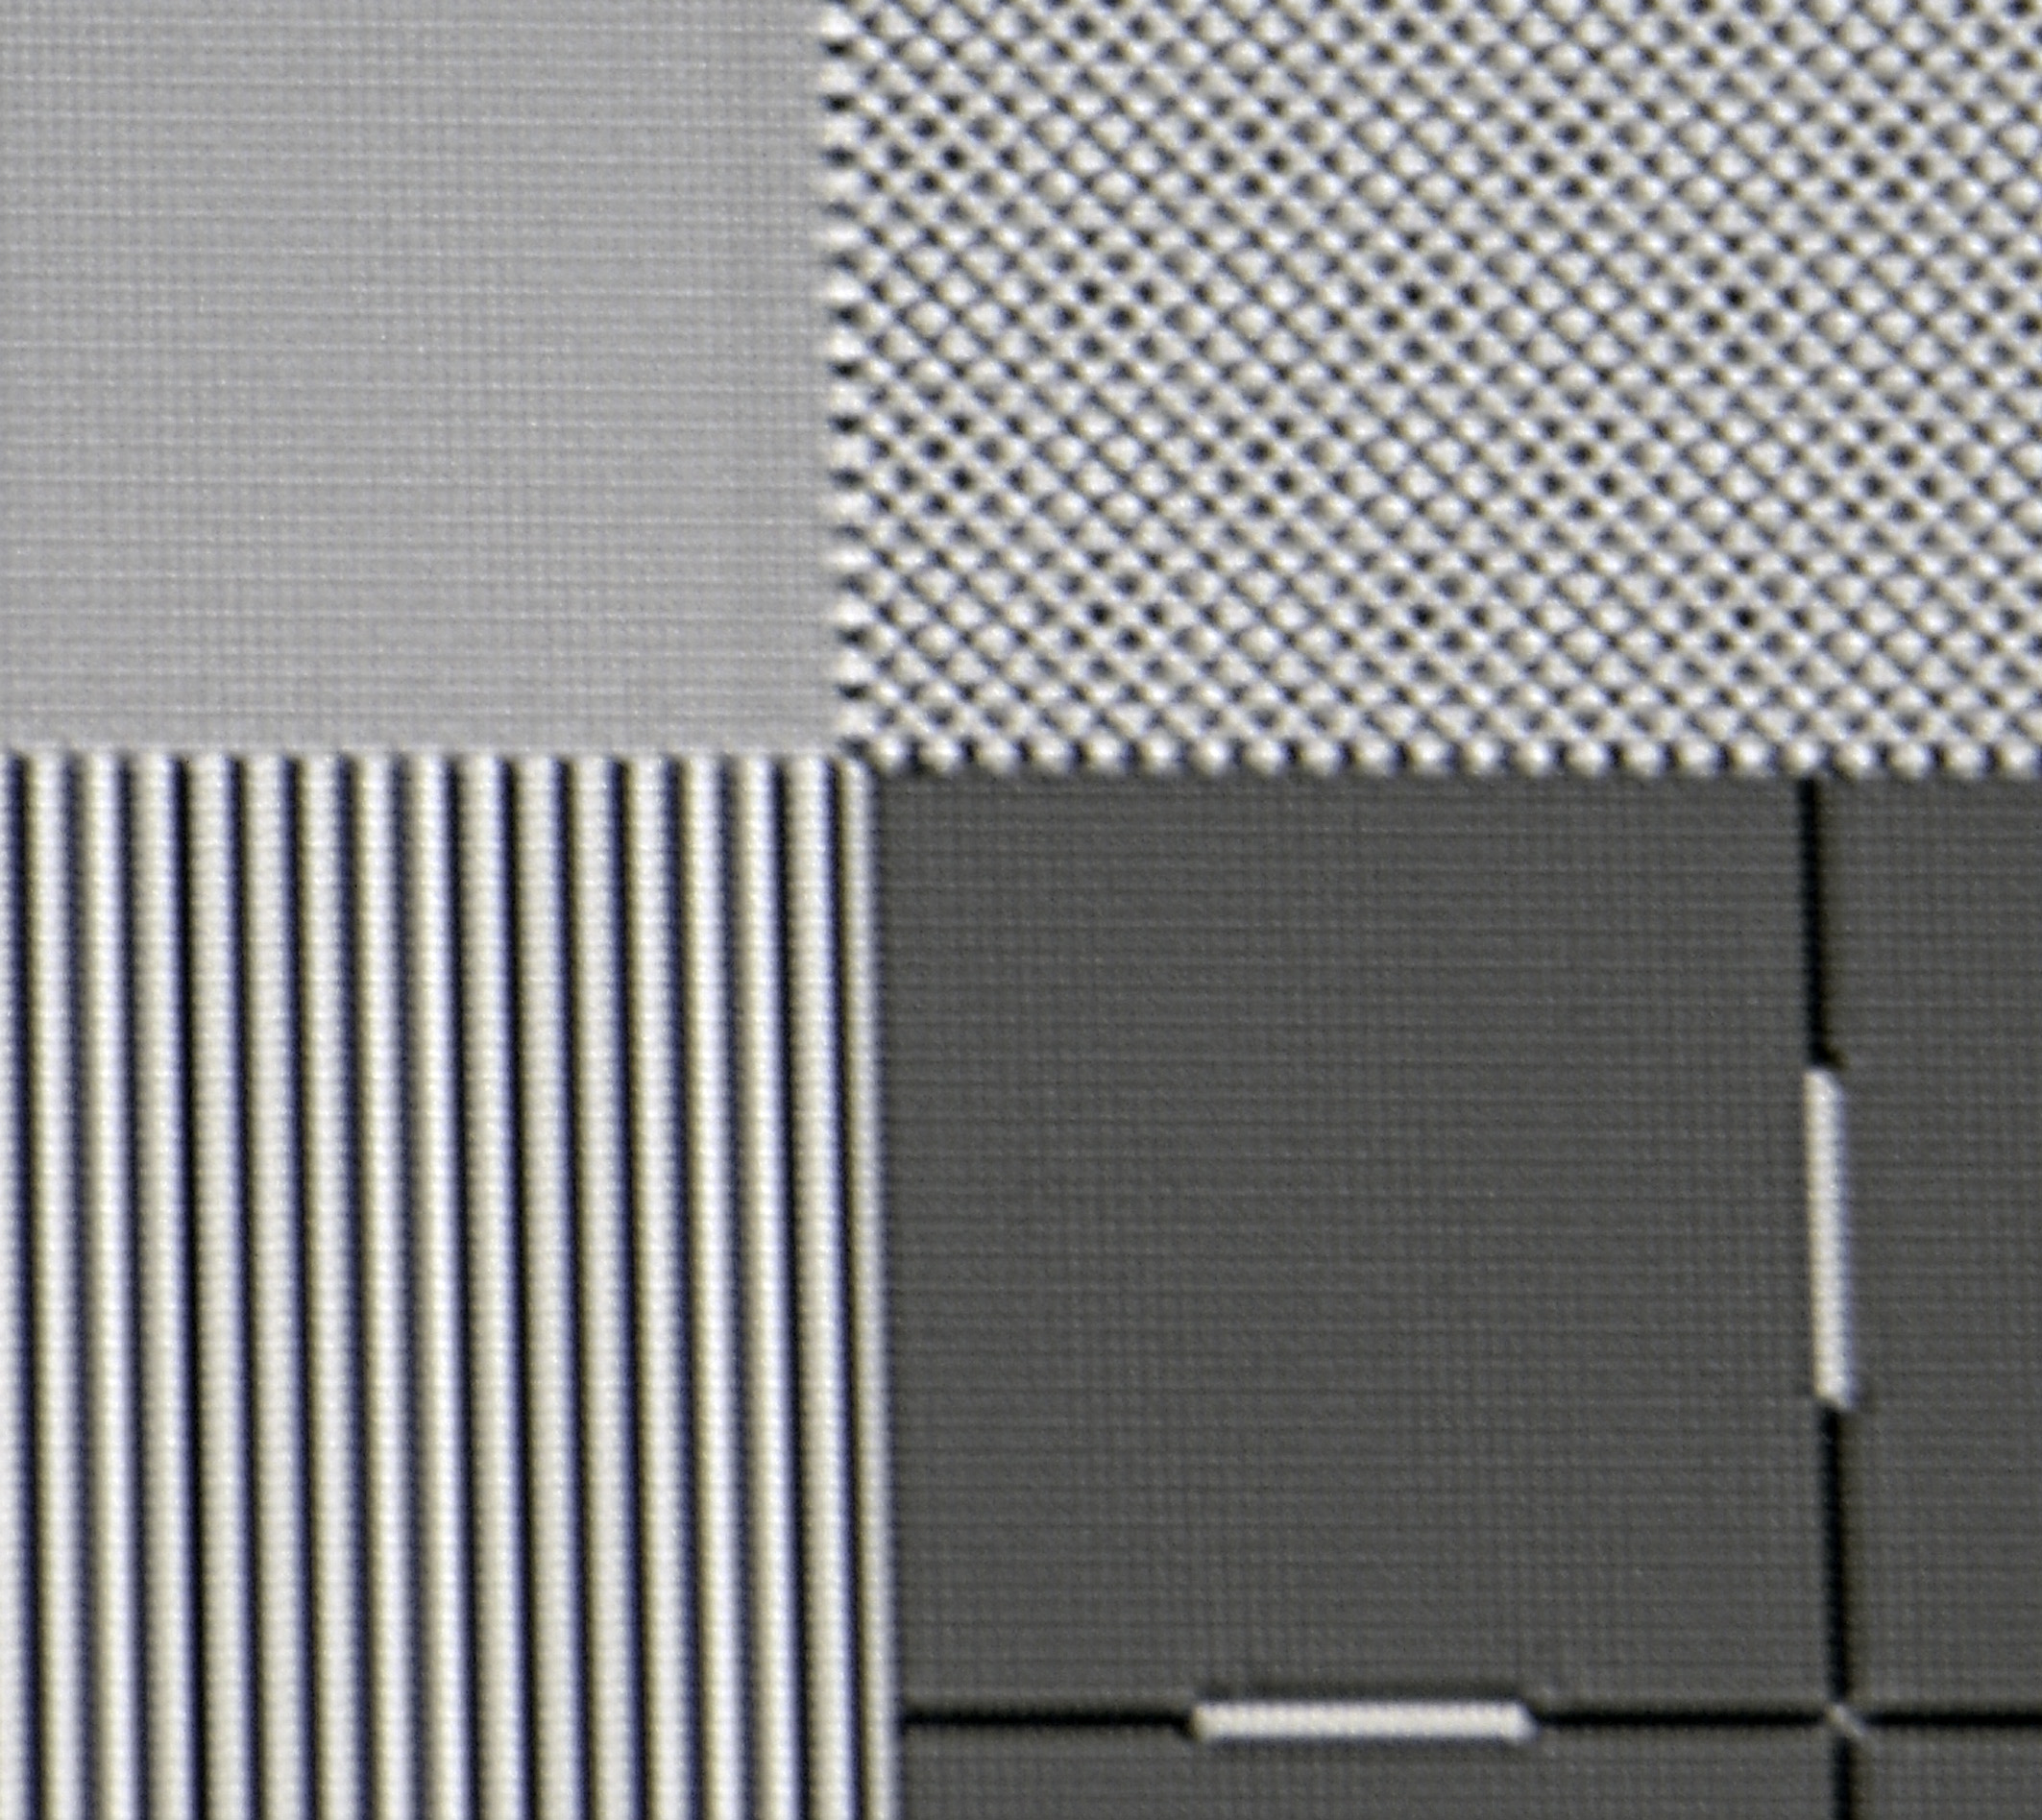 AcerV9800 - Screenshot - 4K-Makroaufnahme - Foto Michael B. Rehders